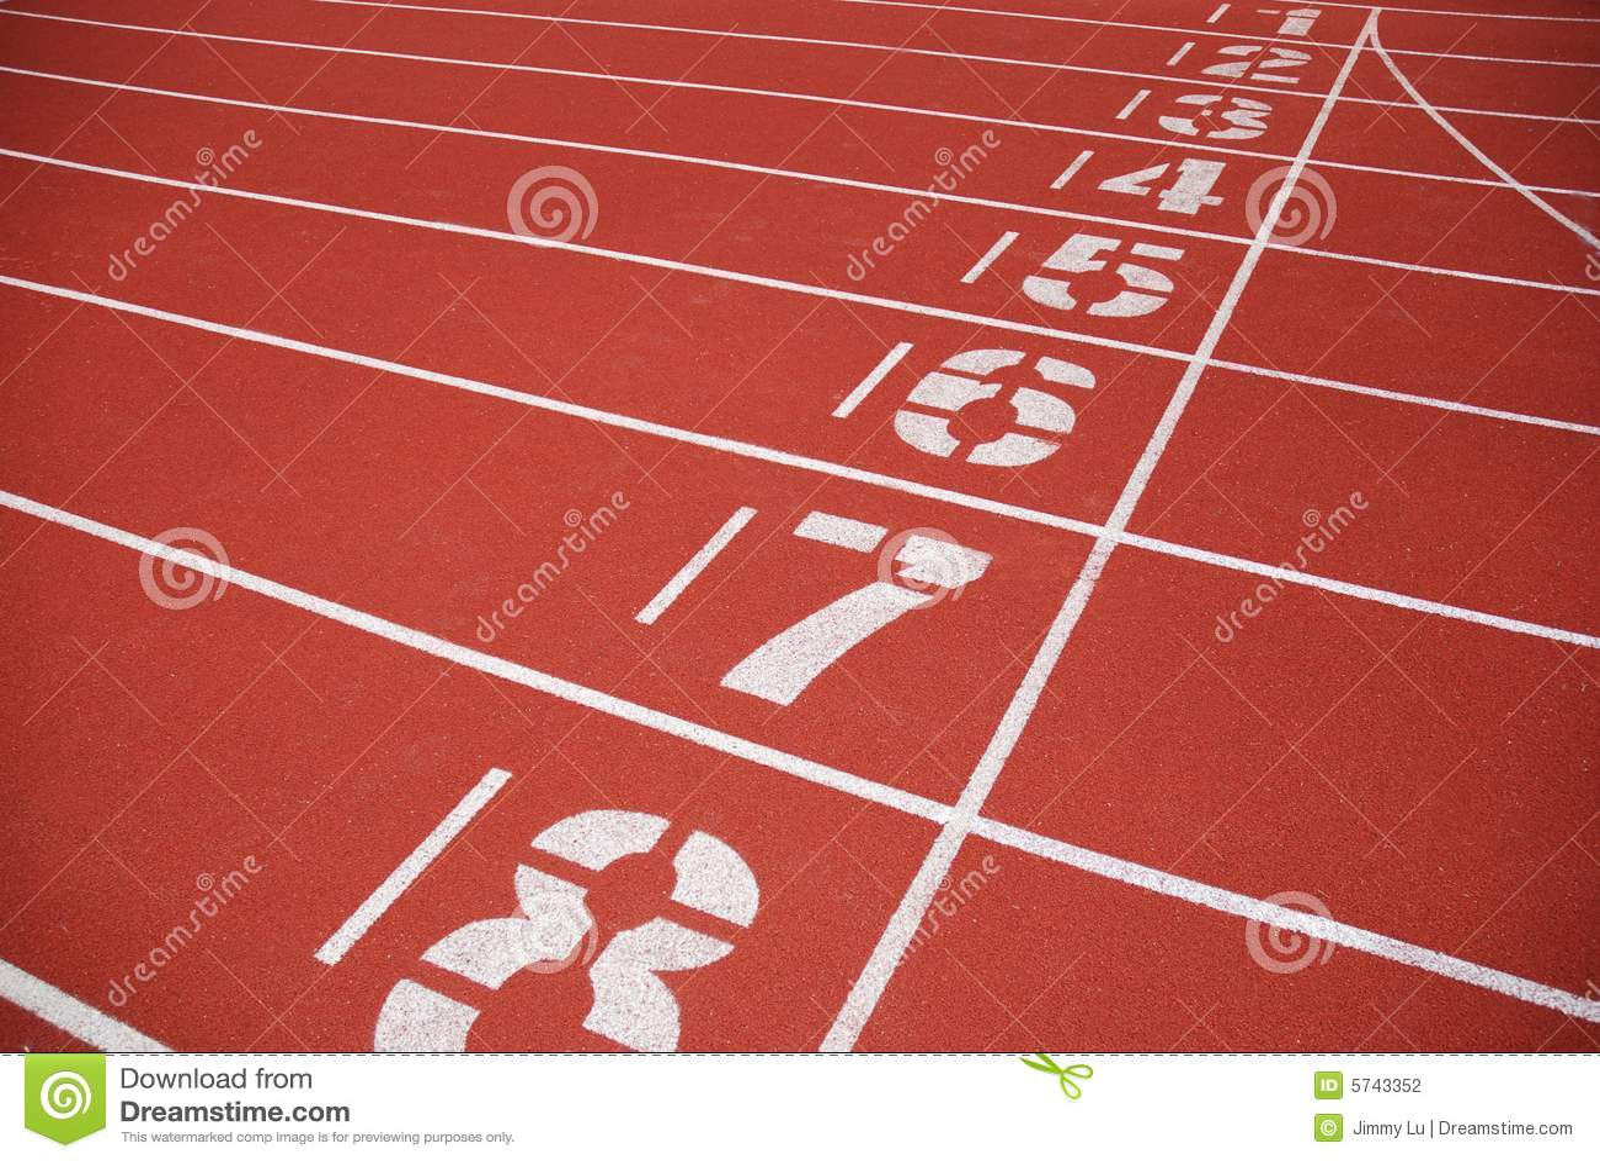 Finish Line Photography: Finish Line Of Running Tracks Stock Photography